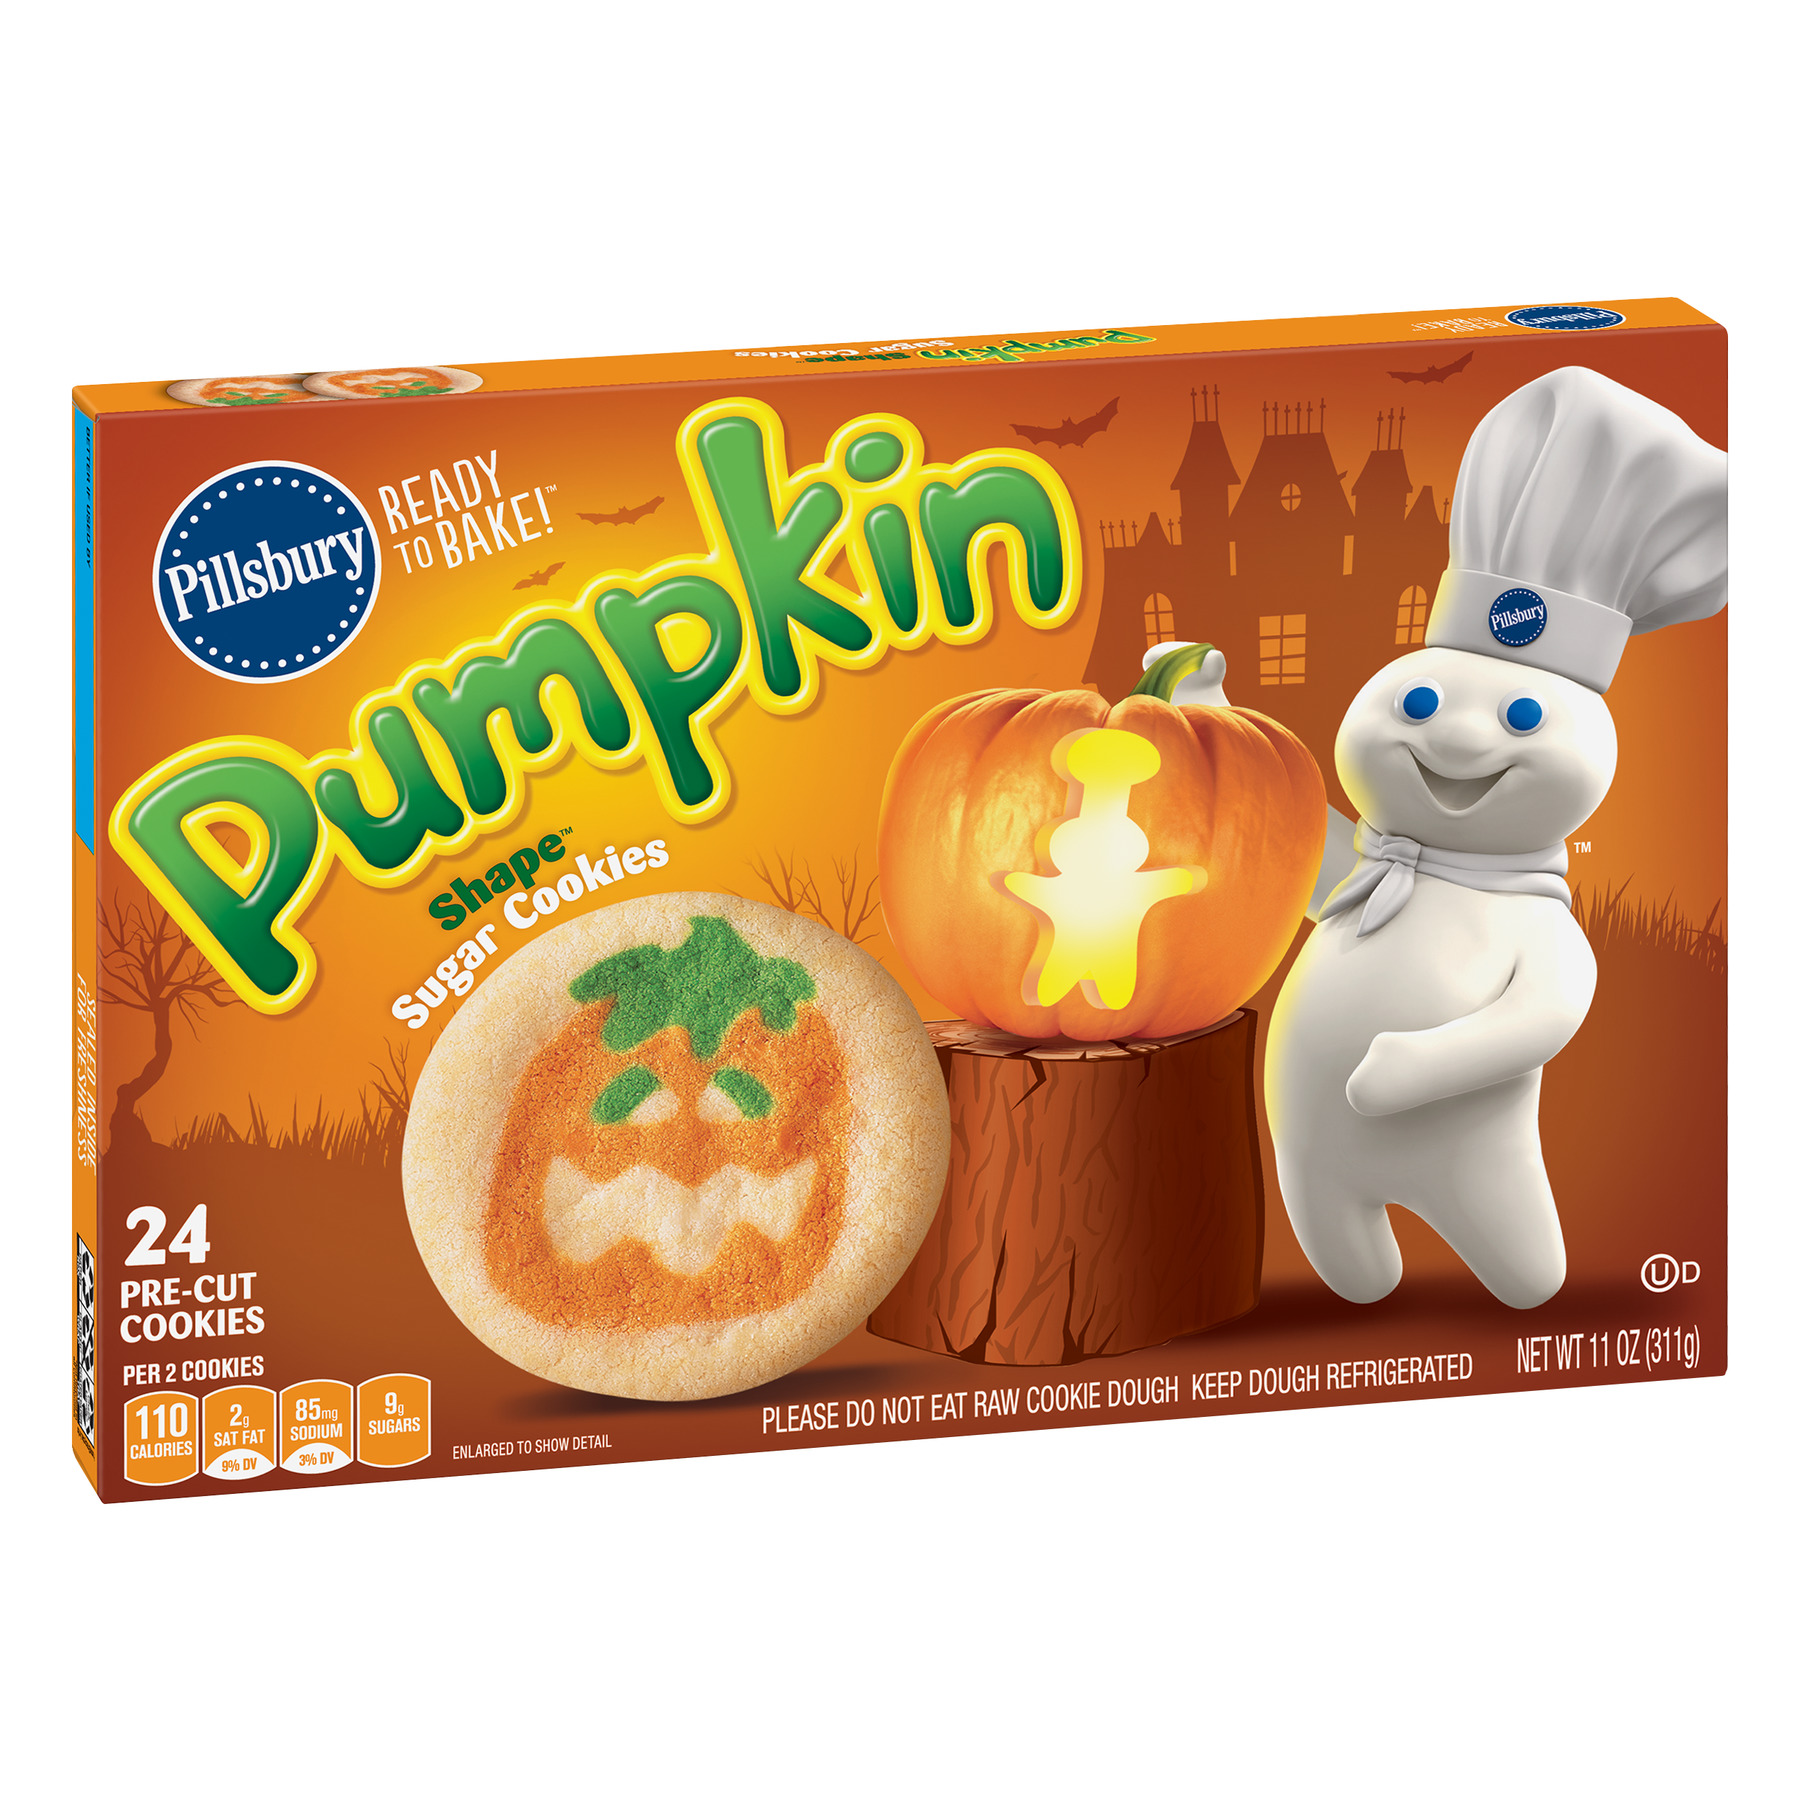 Pillsbury Ready to Bake ™ Pumpkin Shape™ Sugar Cookies Walmart